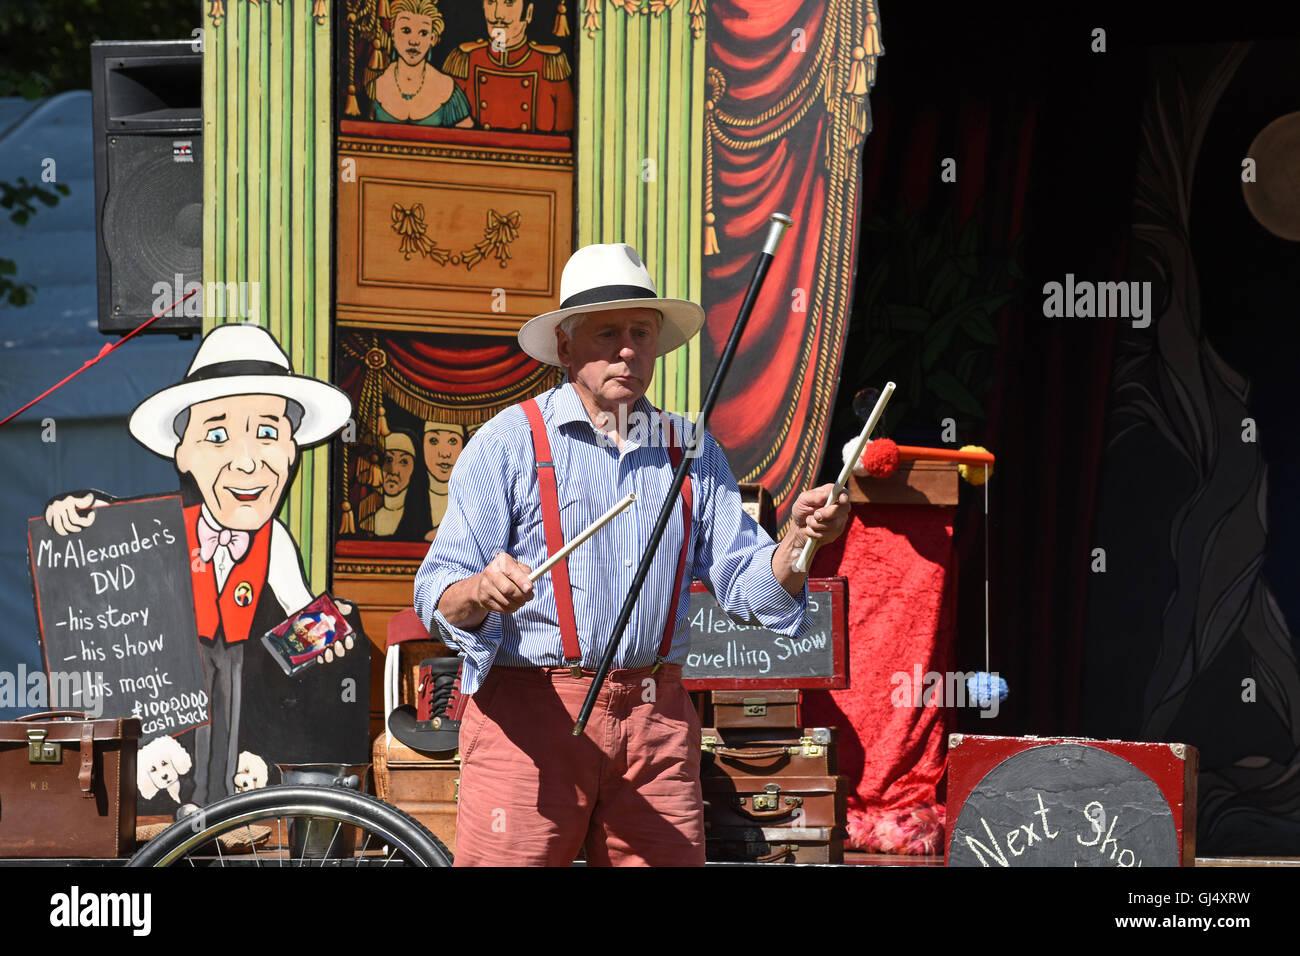 Mr Alexander of Mr Alexander's Travelling Show juggling childrens entertainment entertainer theatrical traveller - Stock Image